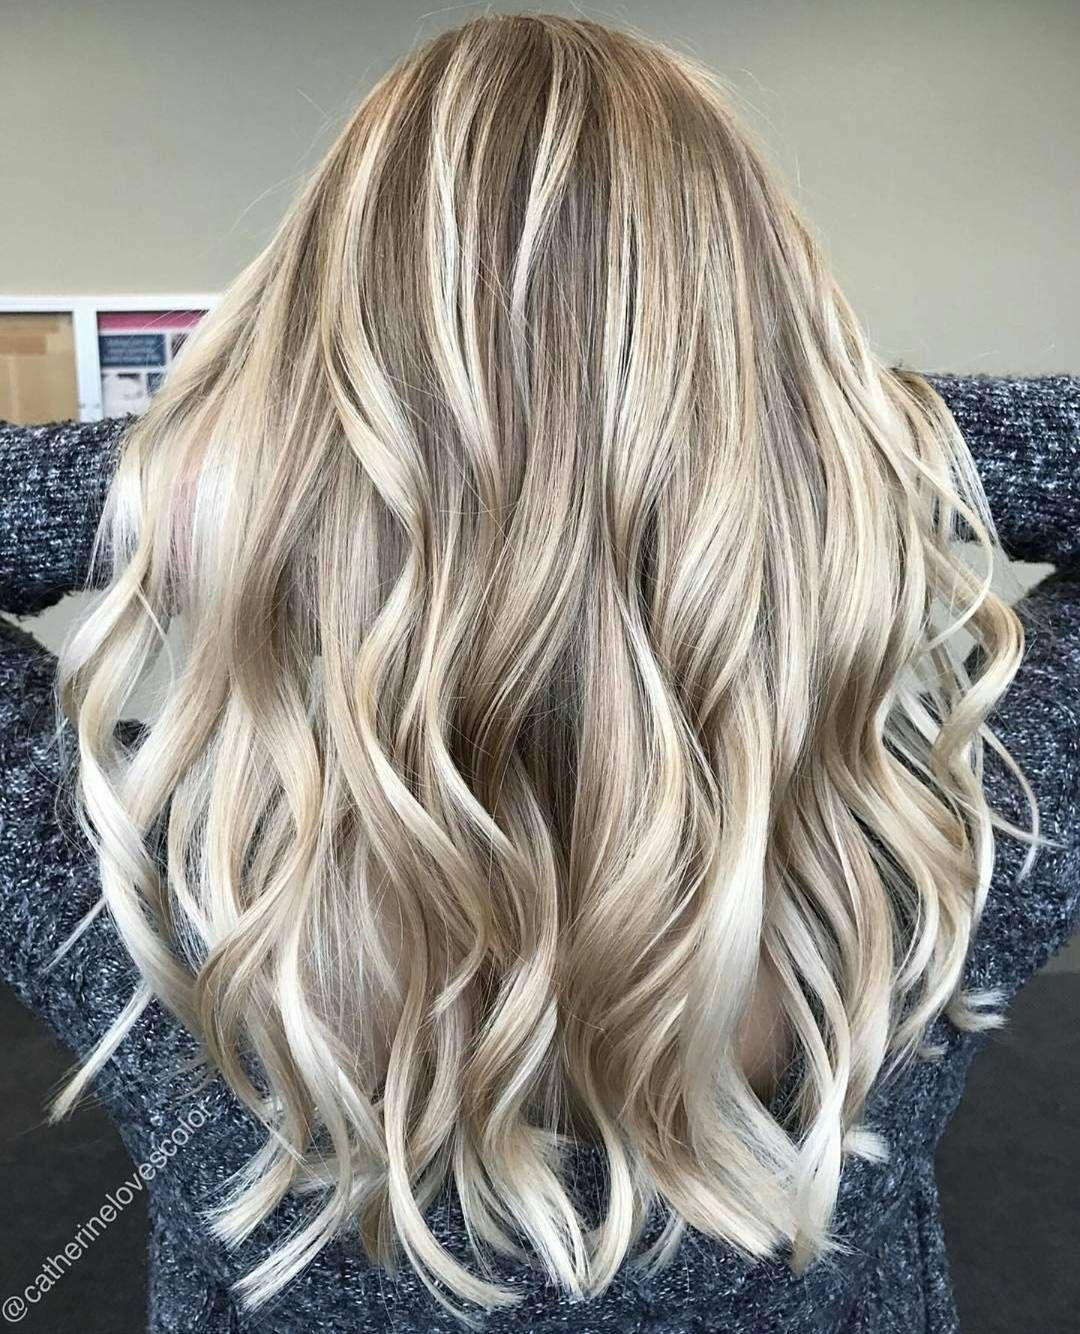 Glorious Blonde - Behindthechair.com